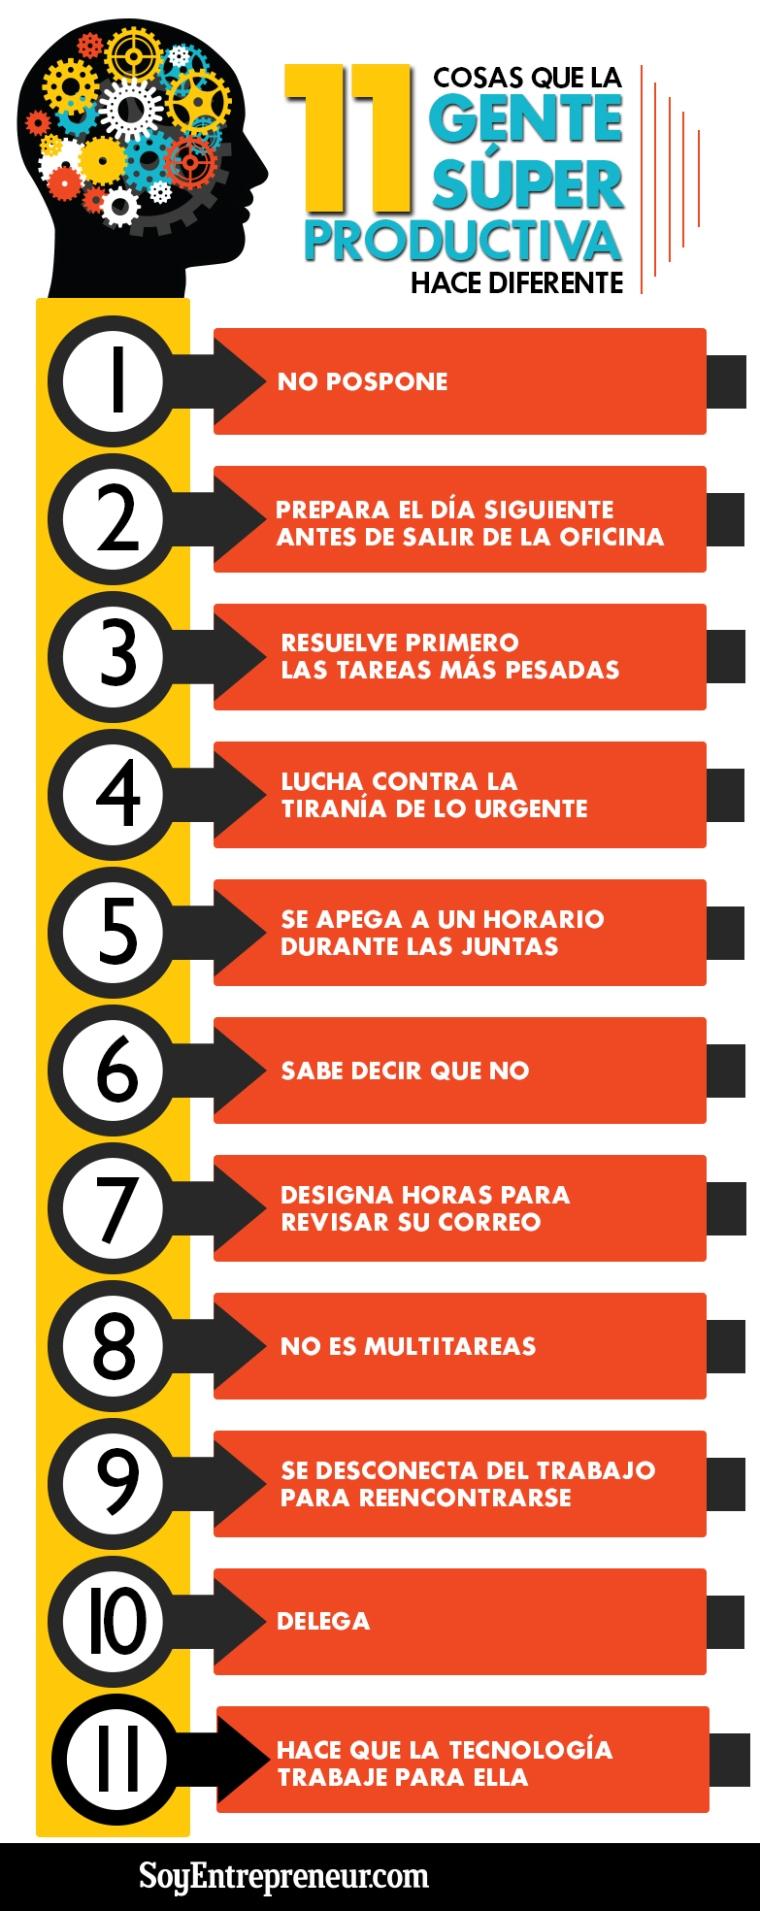 11-cosas-gente-productiva-infografia.jpg